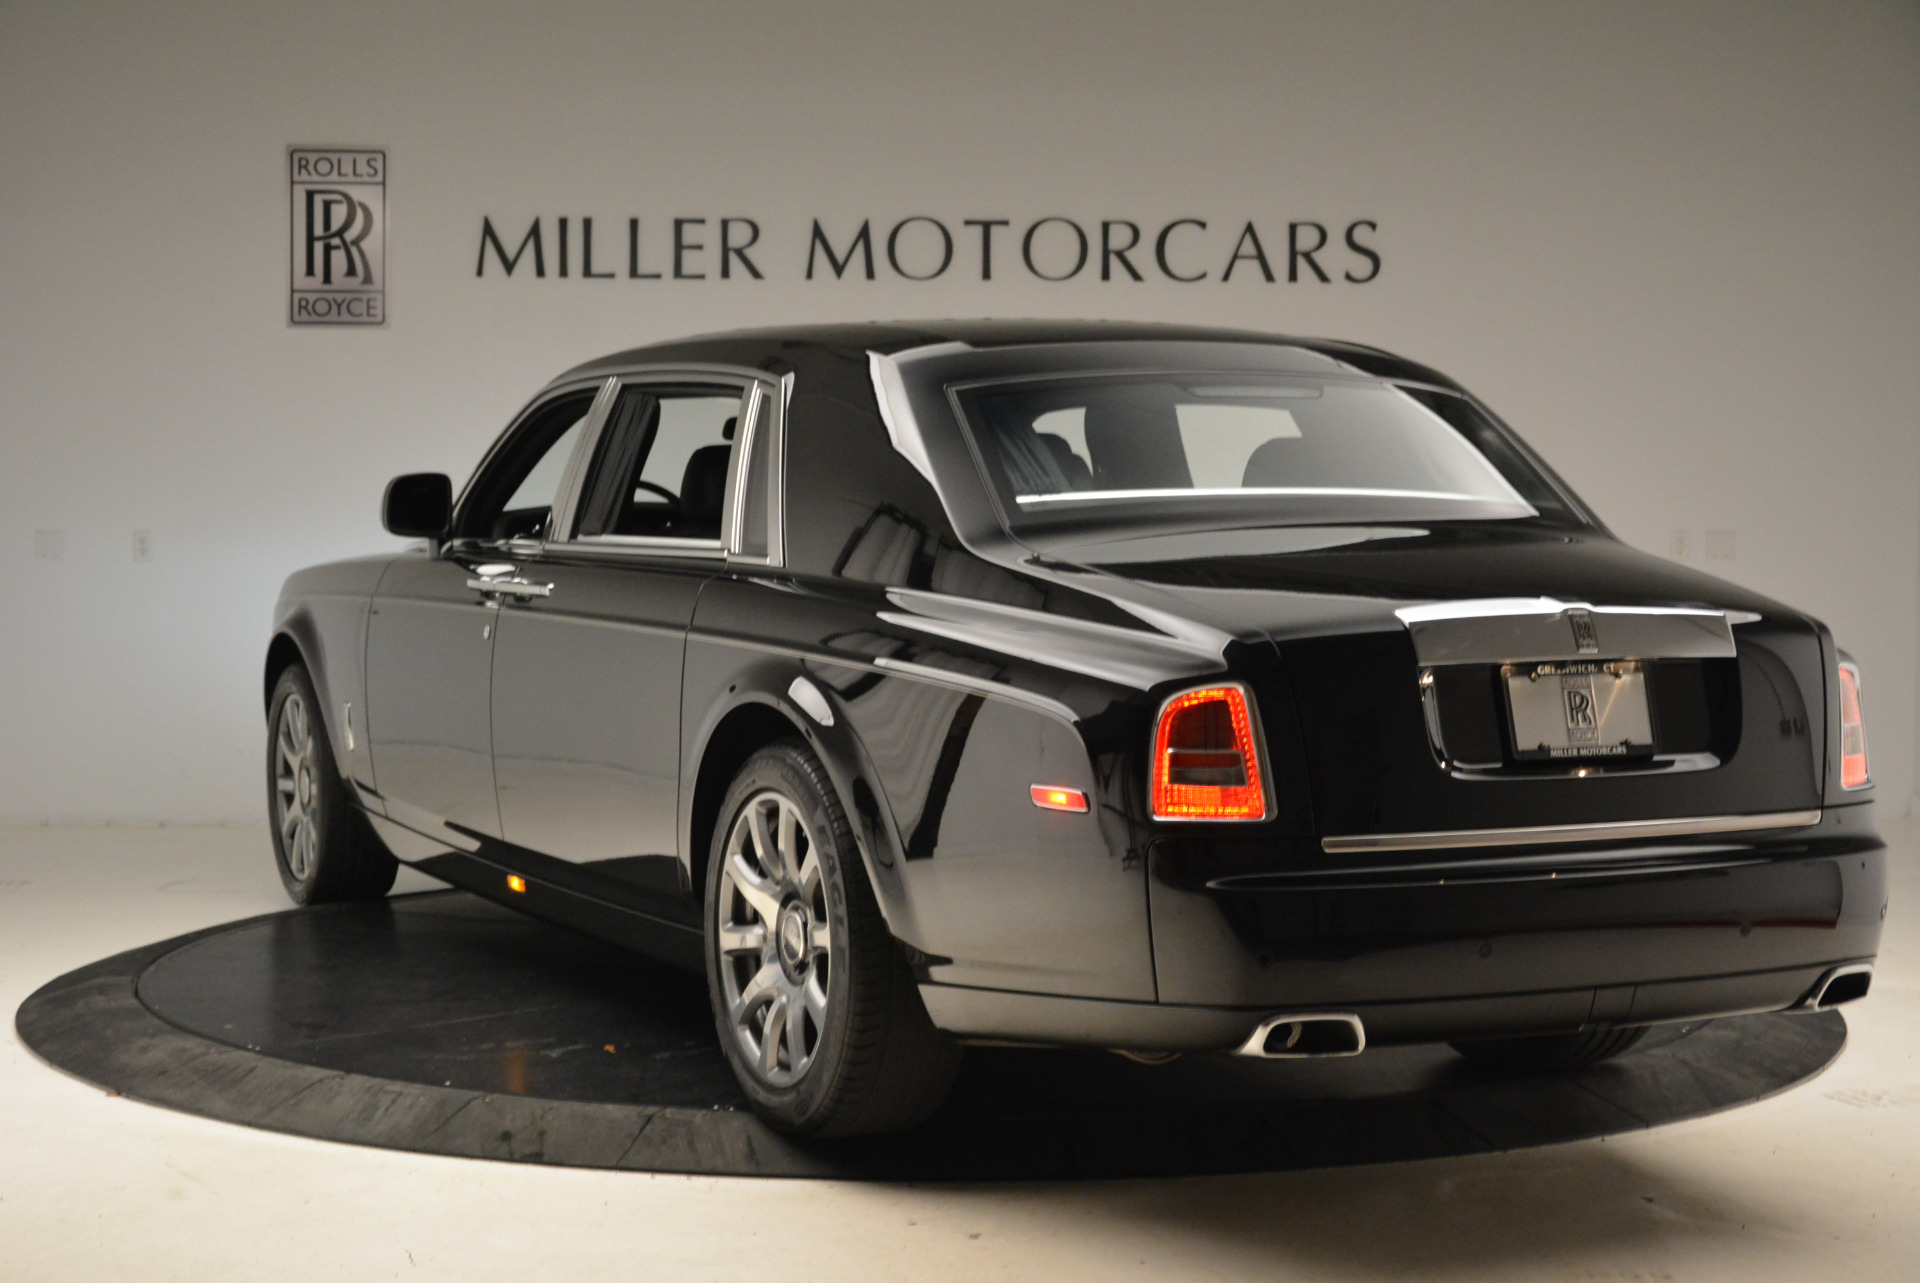 Used 2014 Rolls-Royce Phantom EWB For Sale In Greenwich, CT. Alfa Romeo of Greenwich, 7319 2051_p7